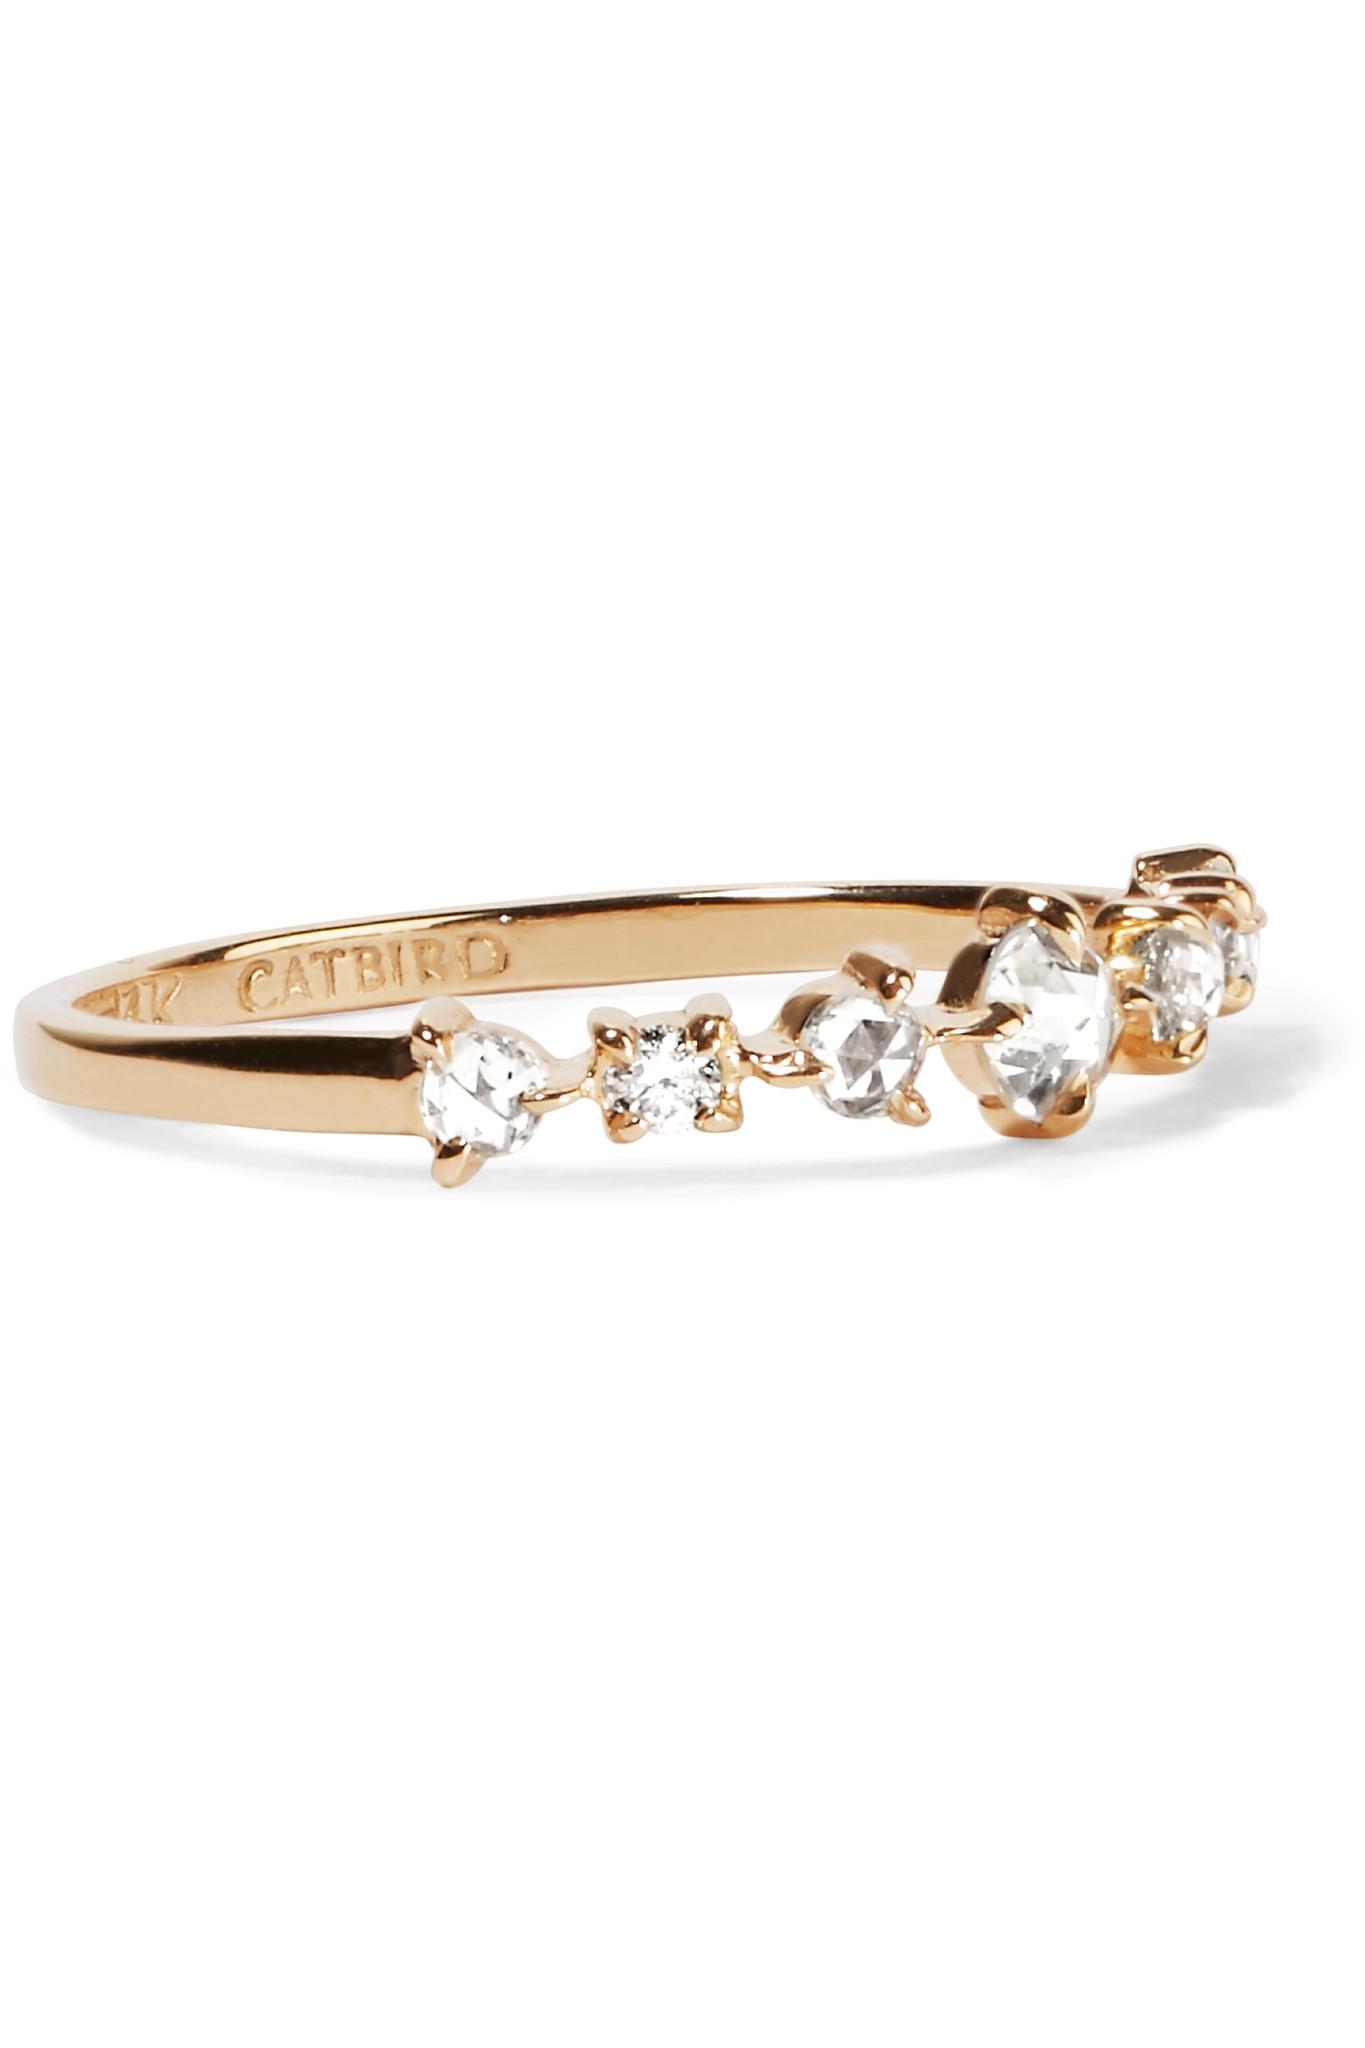 Catbird Snow Queen 14-karat Gold Diamond Ring IcebIIJW